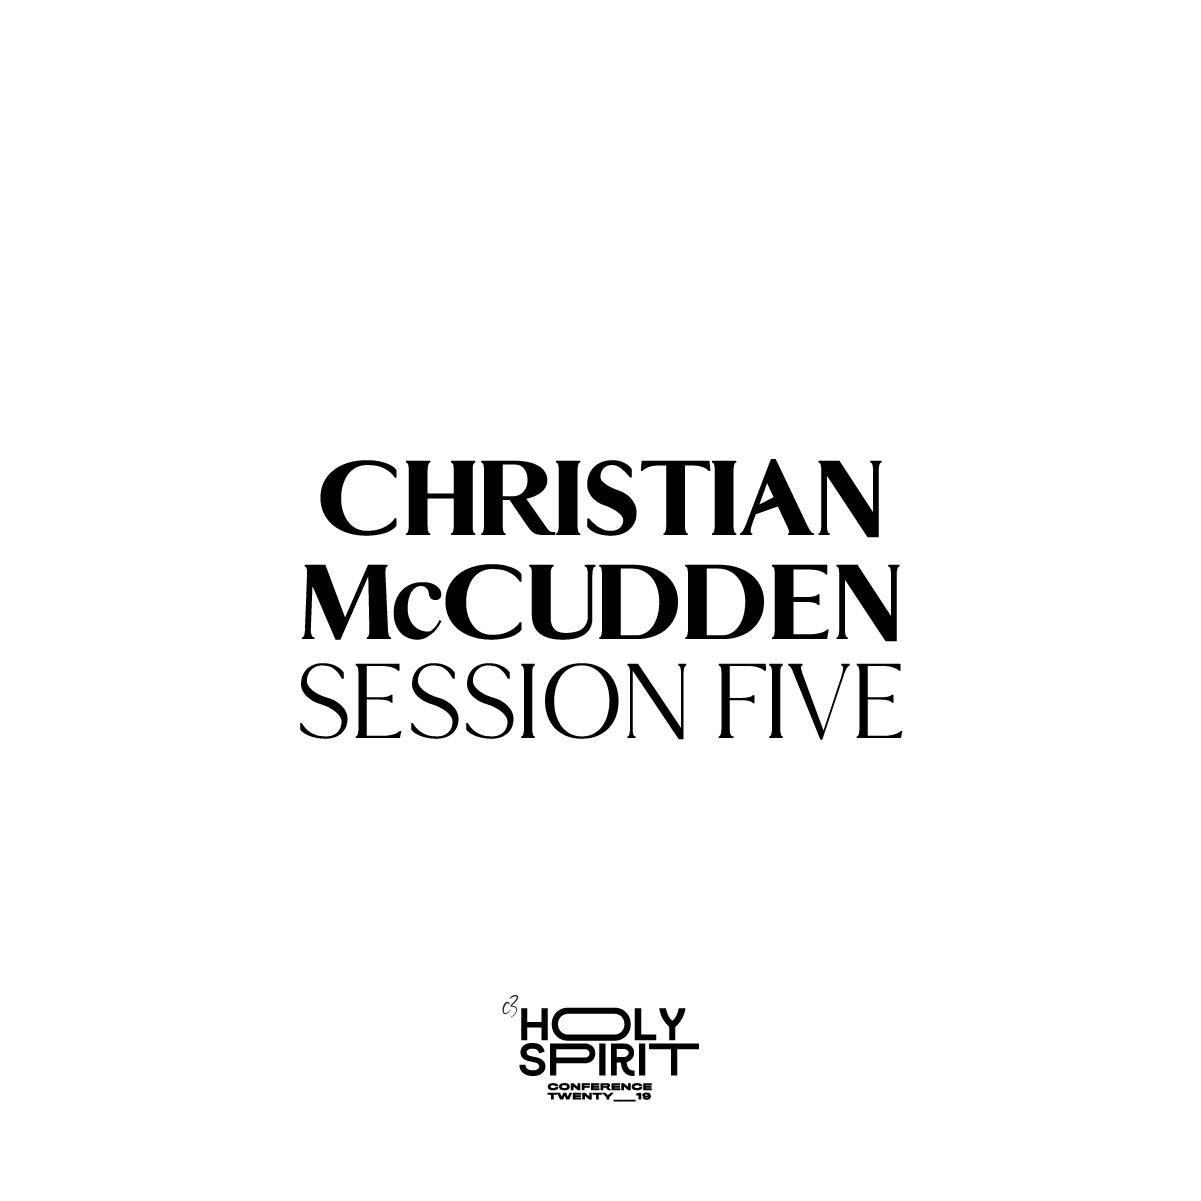 Session 5 - Christian McCudden